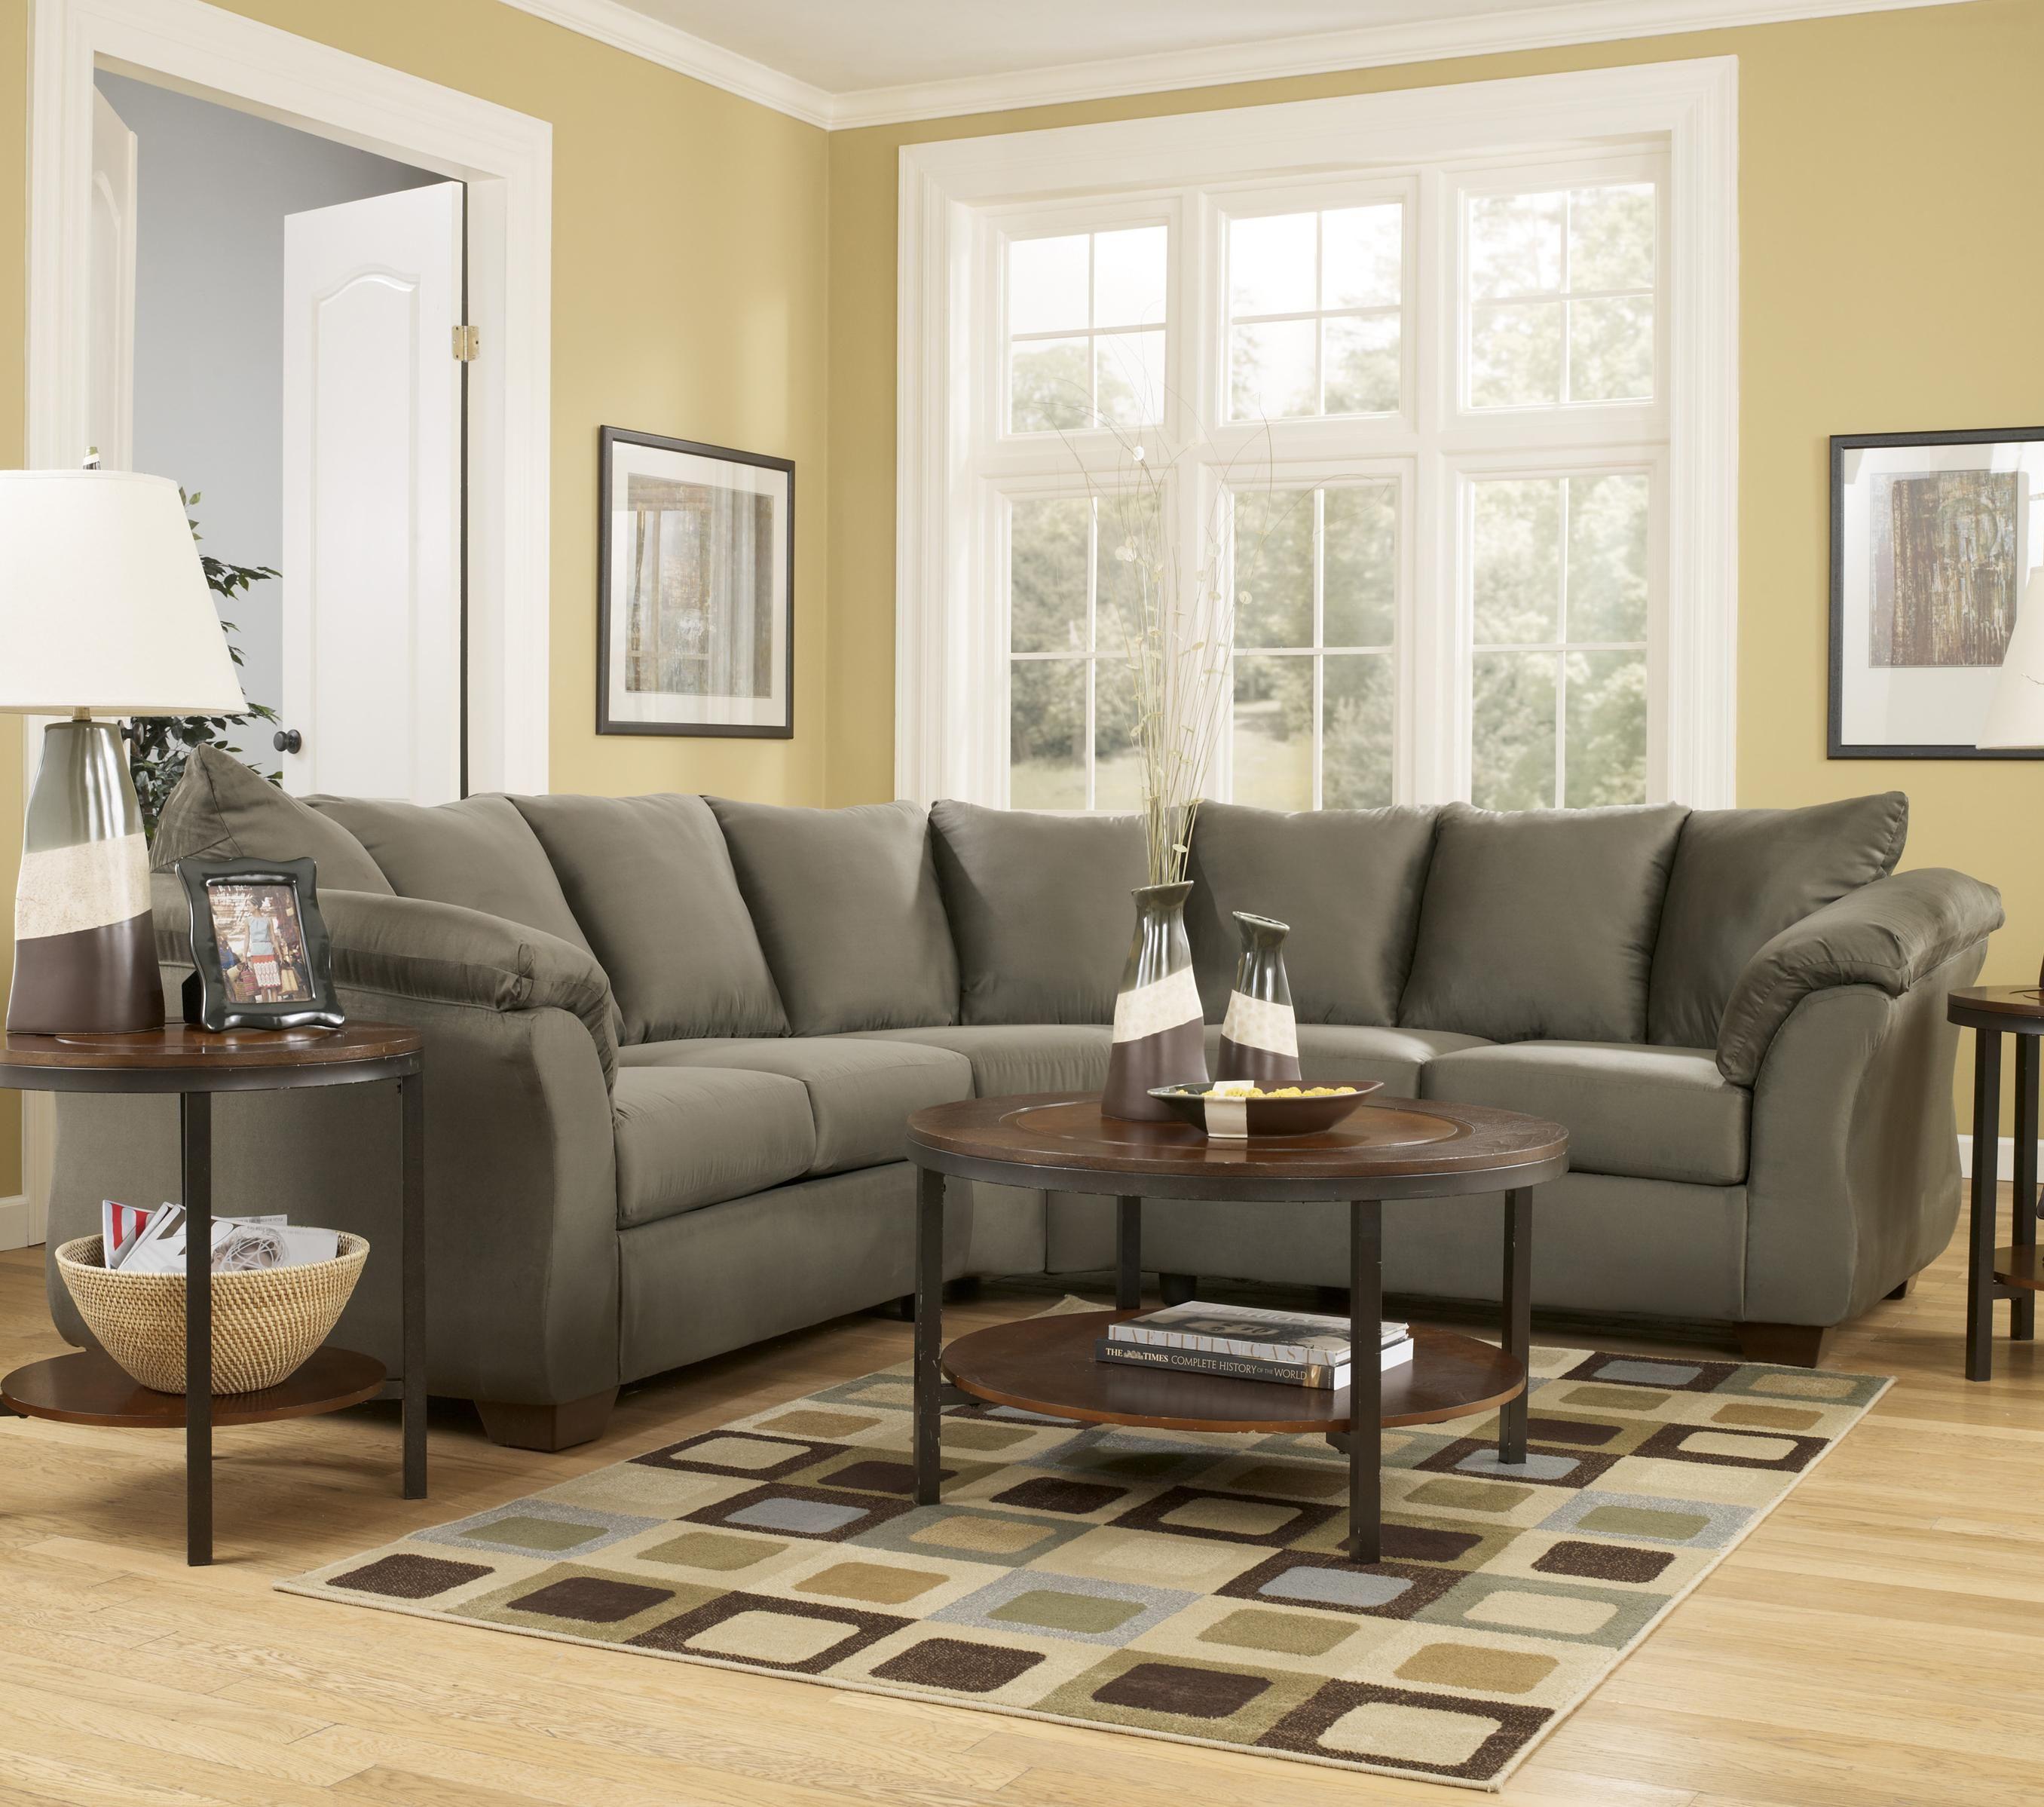 I Marlo Furniture U2013 Rockville 725 Pike Rockville MD 20852 3017389000  Wwwmarlofurniturecom Is A DC Area Furniture Store Chain